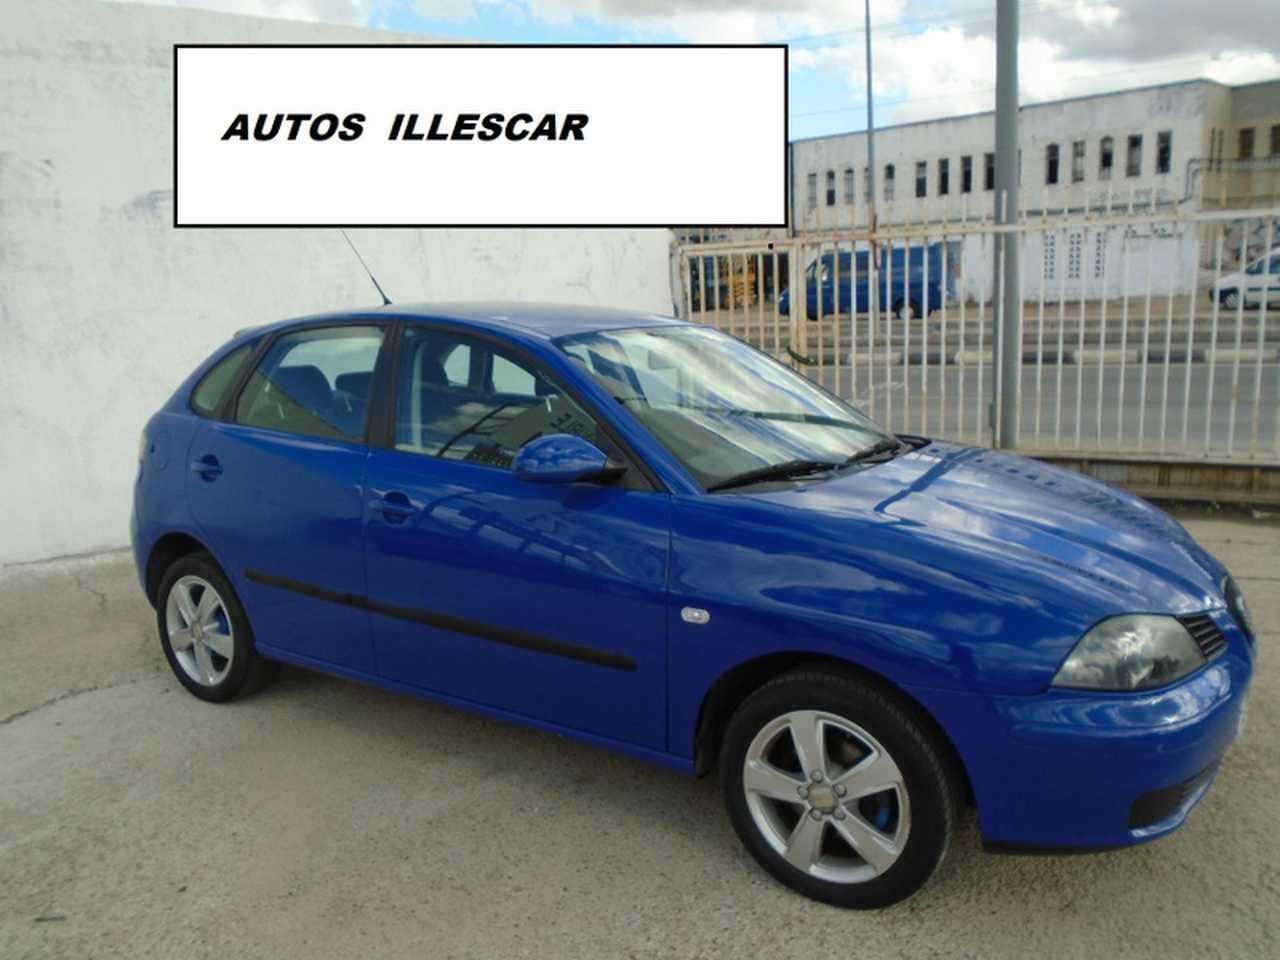 Seat Ibiza 1.9 SDI STELLA 64 CV MUY CUIDADO  - Foto 1